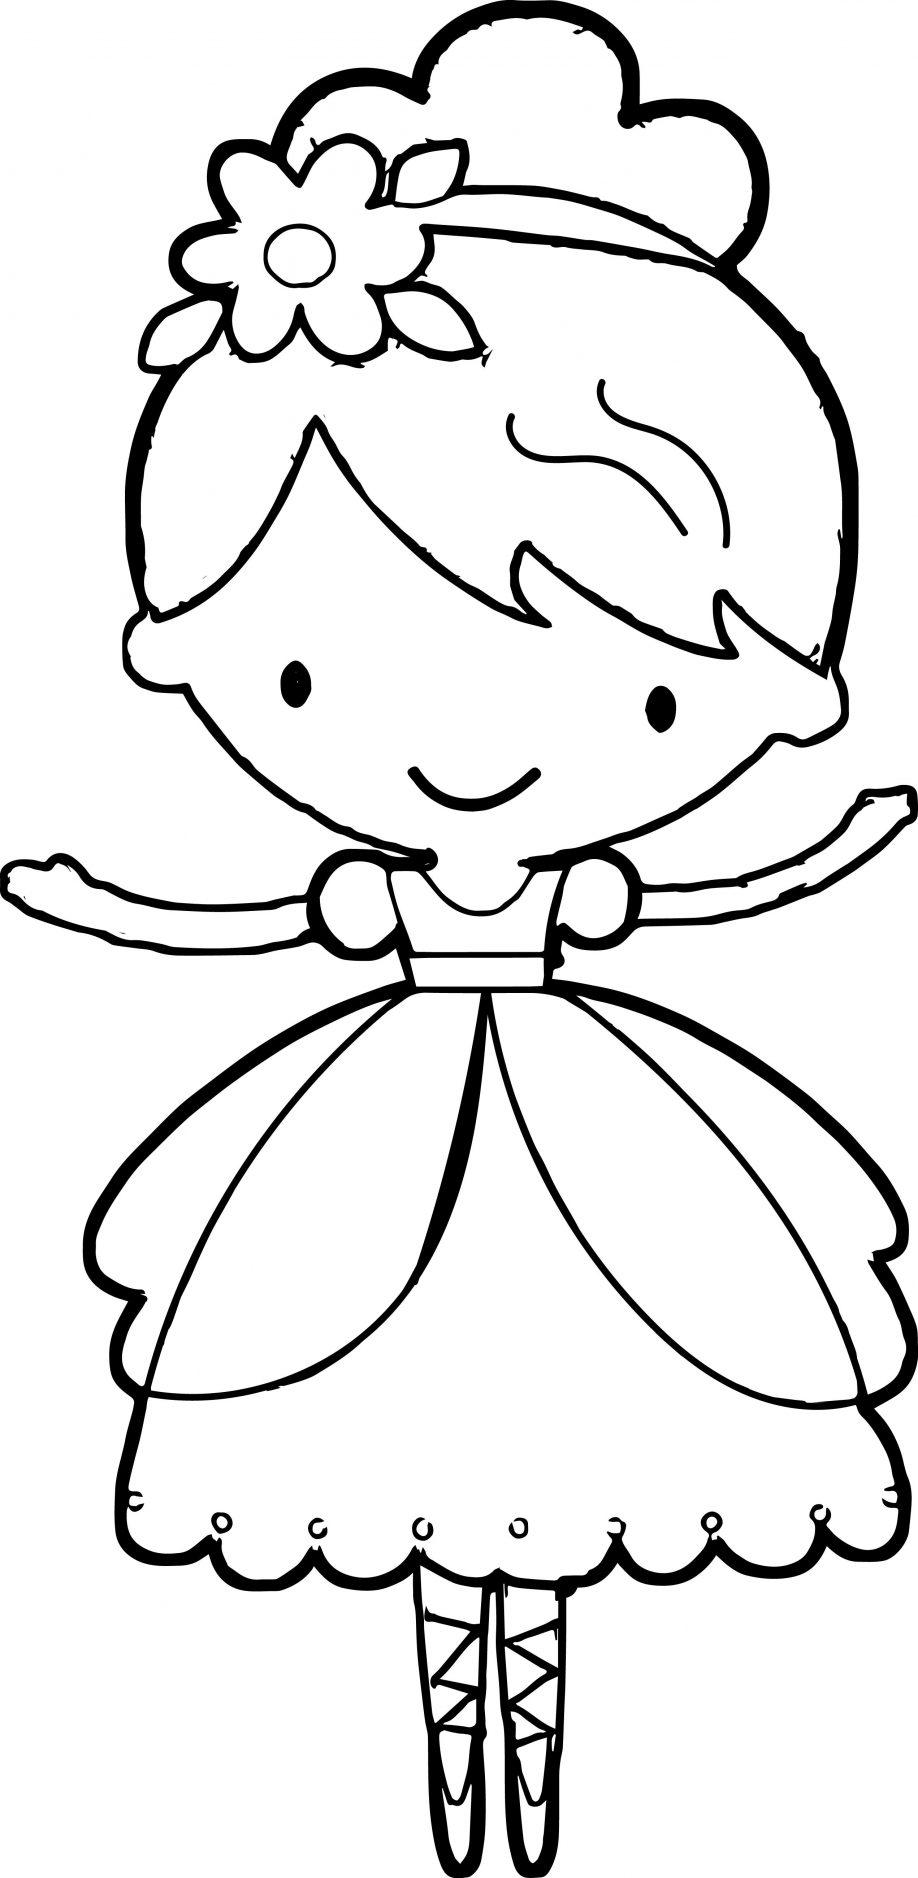 Free Printable Ballerina Coloring Pages at GetDrawings ...